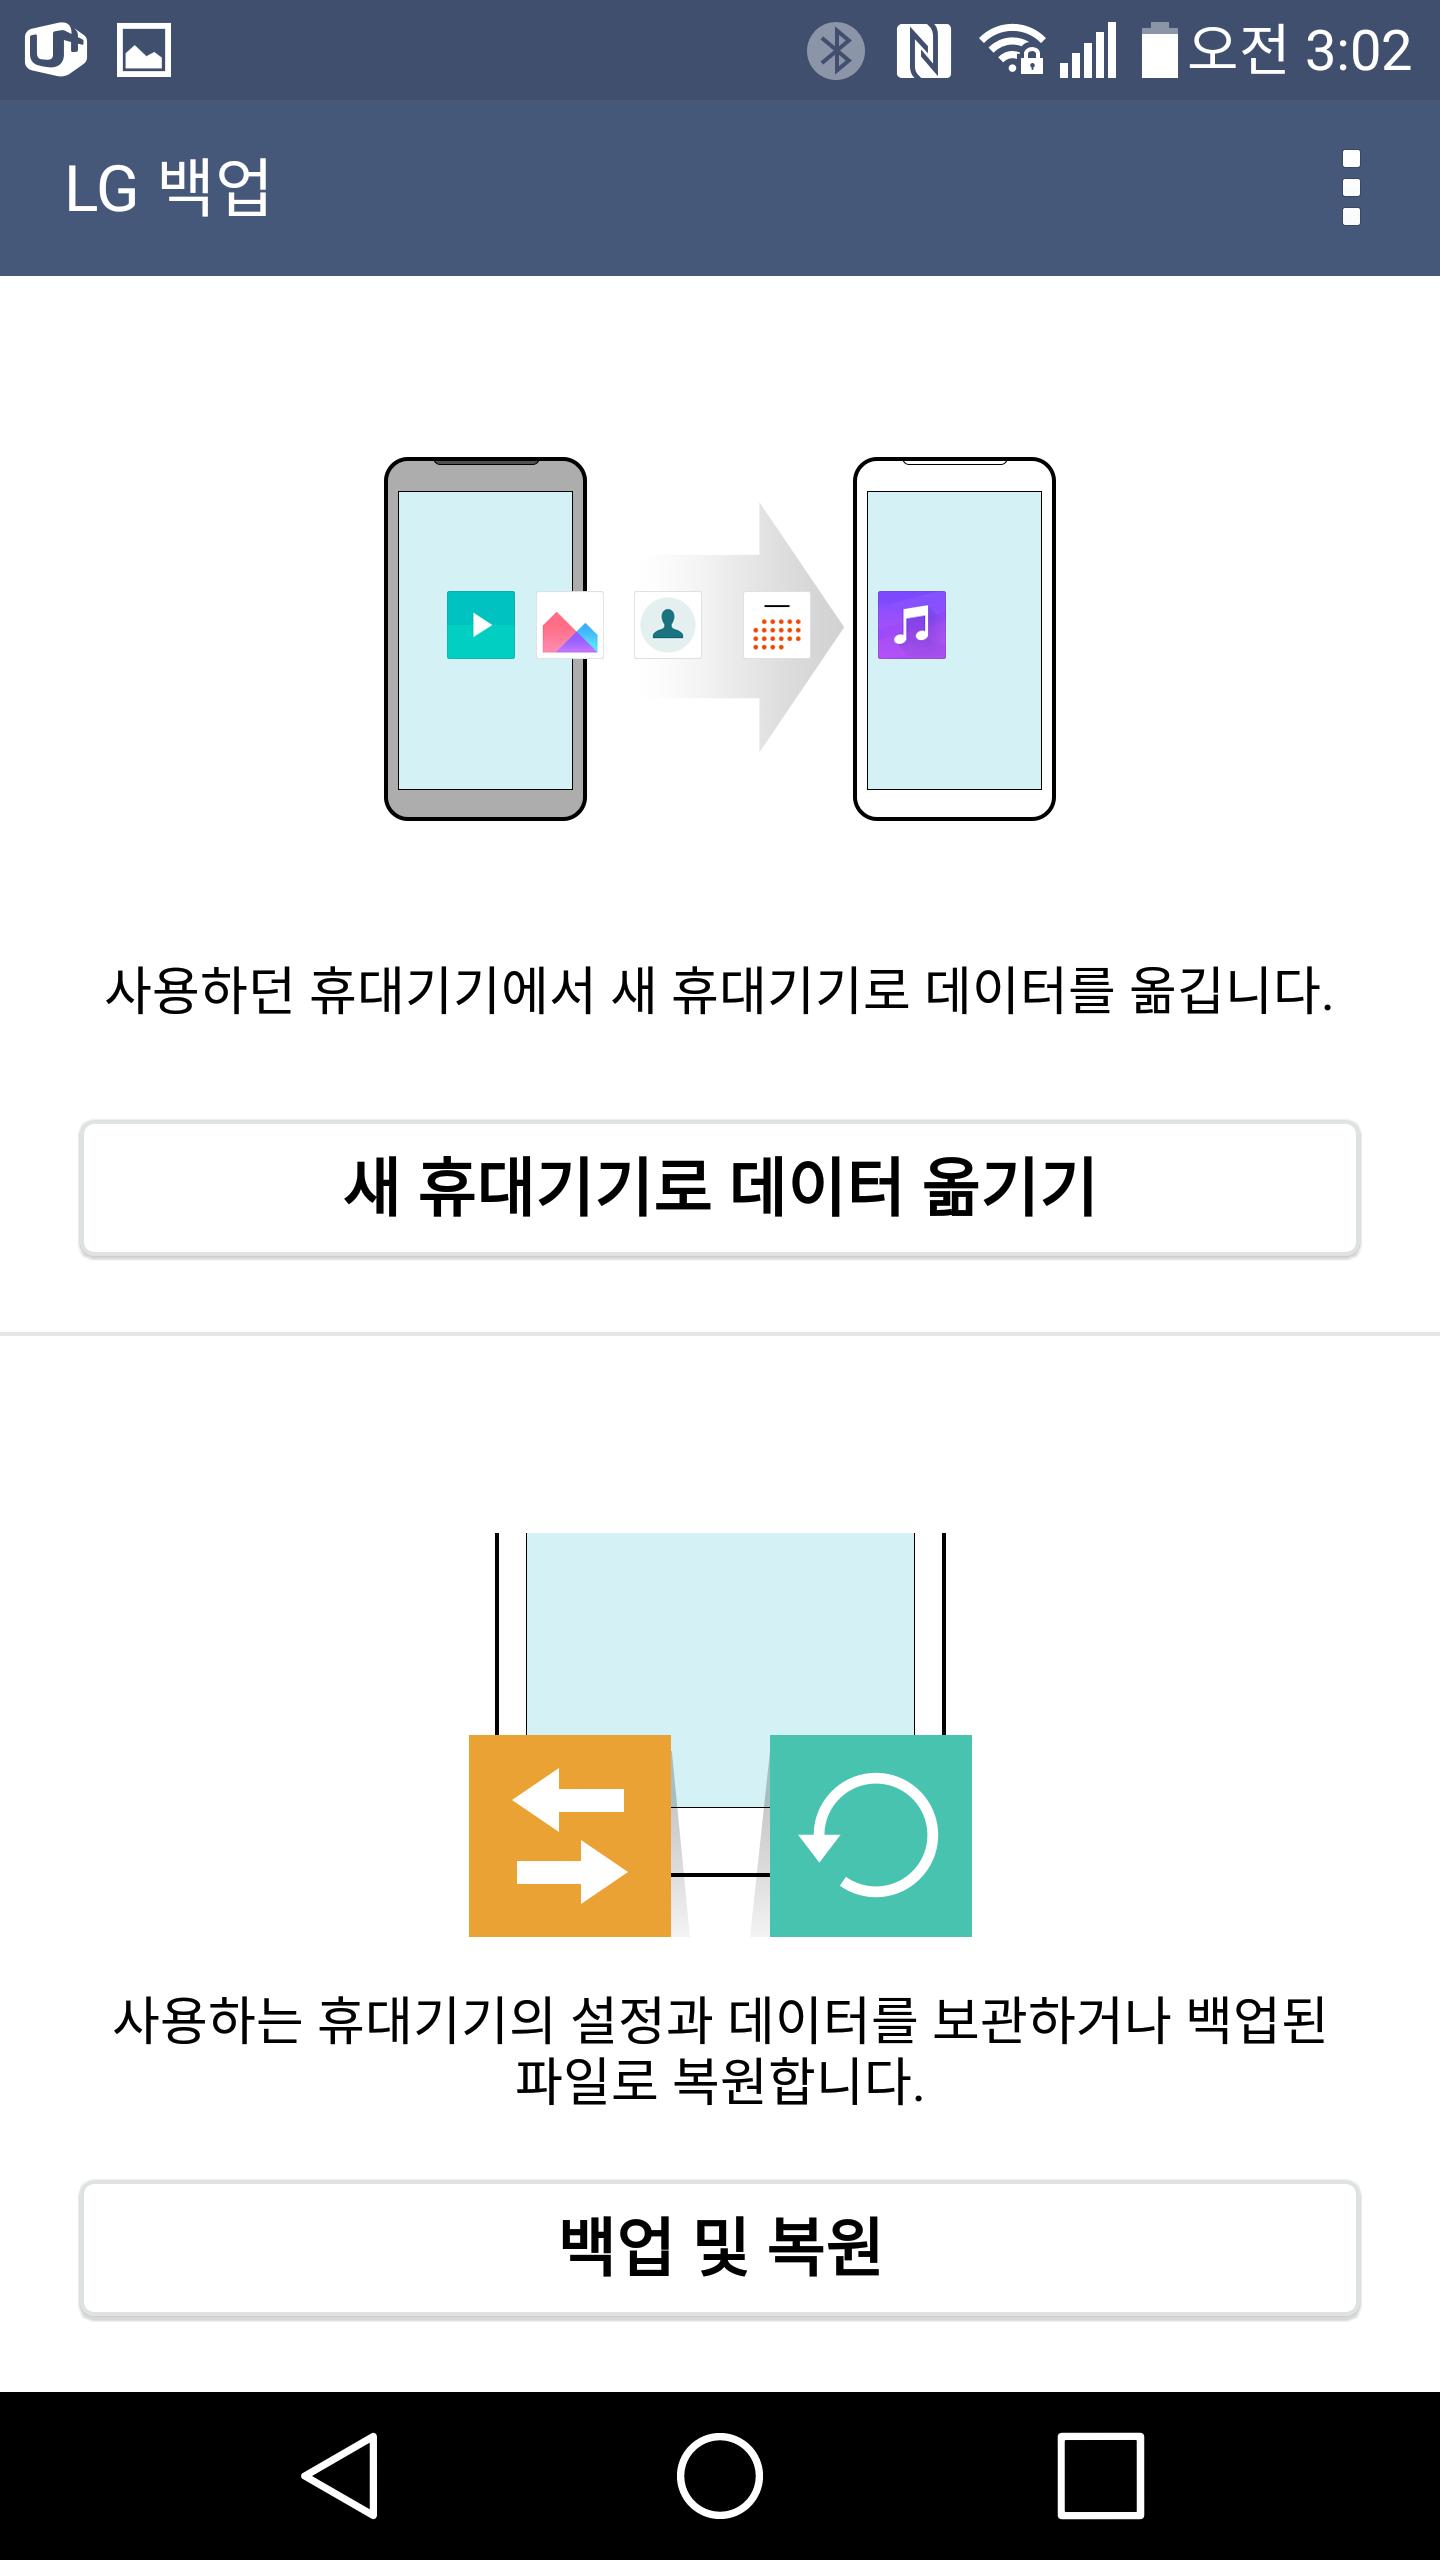 McAfee Mobile Security, LG G4  ,기기보안, 기기 찾기,IT,모바일,맥아피,악성코드,스마트폰 악성코드,인텔 시큐리티,McAfee Mobile Security 를 이용해서 LG G4를 관리하면서 기기보안 기기 찾기 LG 백업 등을 이용하는 방법을 배워보도록 하겠습니다. 맥아피는 글로벌 보안 회사로 최근 인텔 시큐리티로 사명이 변경되었습니다. 보통은 악성코드만 검사해주는 툴로 알고 계신 분들이 많을텐데요. 하지만 McAfee Mobile Security를 이용하면 기기보안은 물론 백업 기기찾기 등 다양한 작업을 수행할 수 있습니다. 스마트폰을 집에 놓고 오면 아무것도 못하는 분들도 많이 있을 것 입니다. 저 역시도 그러한데요. 대부분의 정보를스마트폰으로 확인해야 하기 때문입니다. 정보가 한곳에 많이 모여있을 수 록 보안은 더 철저하게 지켜야 합니다. 그런데 스마트폰에서의 보안 어떻게 신경써야할까요. McAfee Mobile Security 를 이용하면 좀 더 쉽게 관리 할 수 있습니다. 스마트폰을 바꿔야할 때에도 쉽게 데이터를 이동시킬 수 있으며, 스마트폰을 분실했을 때에도 좀 더 적극적으로 찾을 수 있습니다.